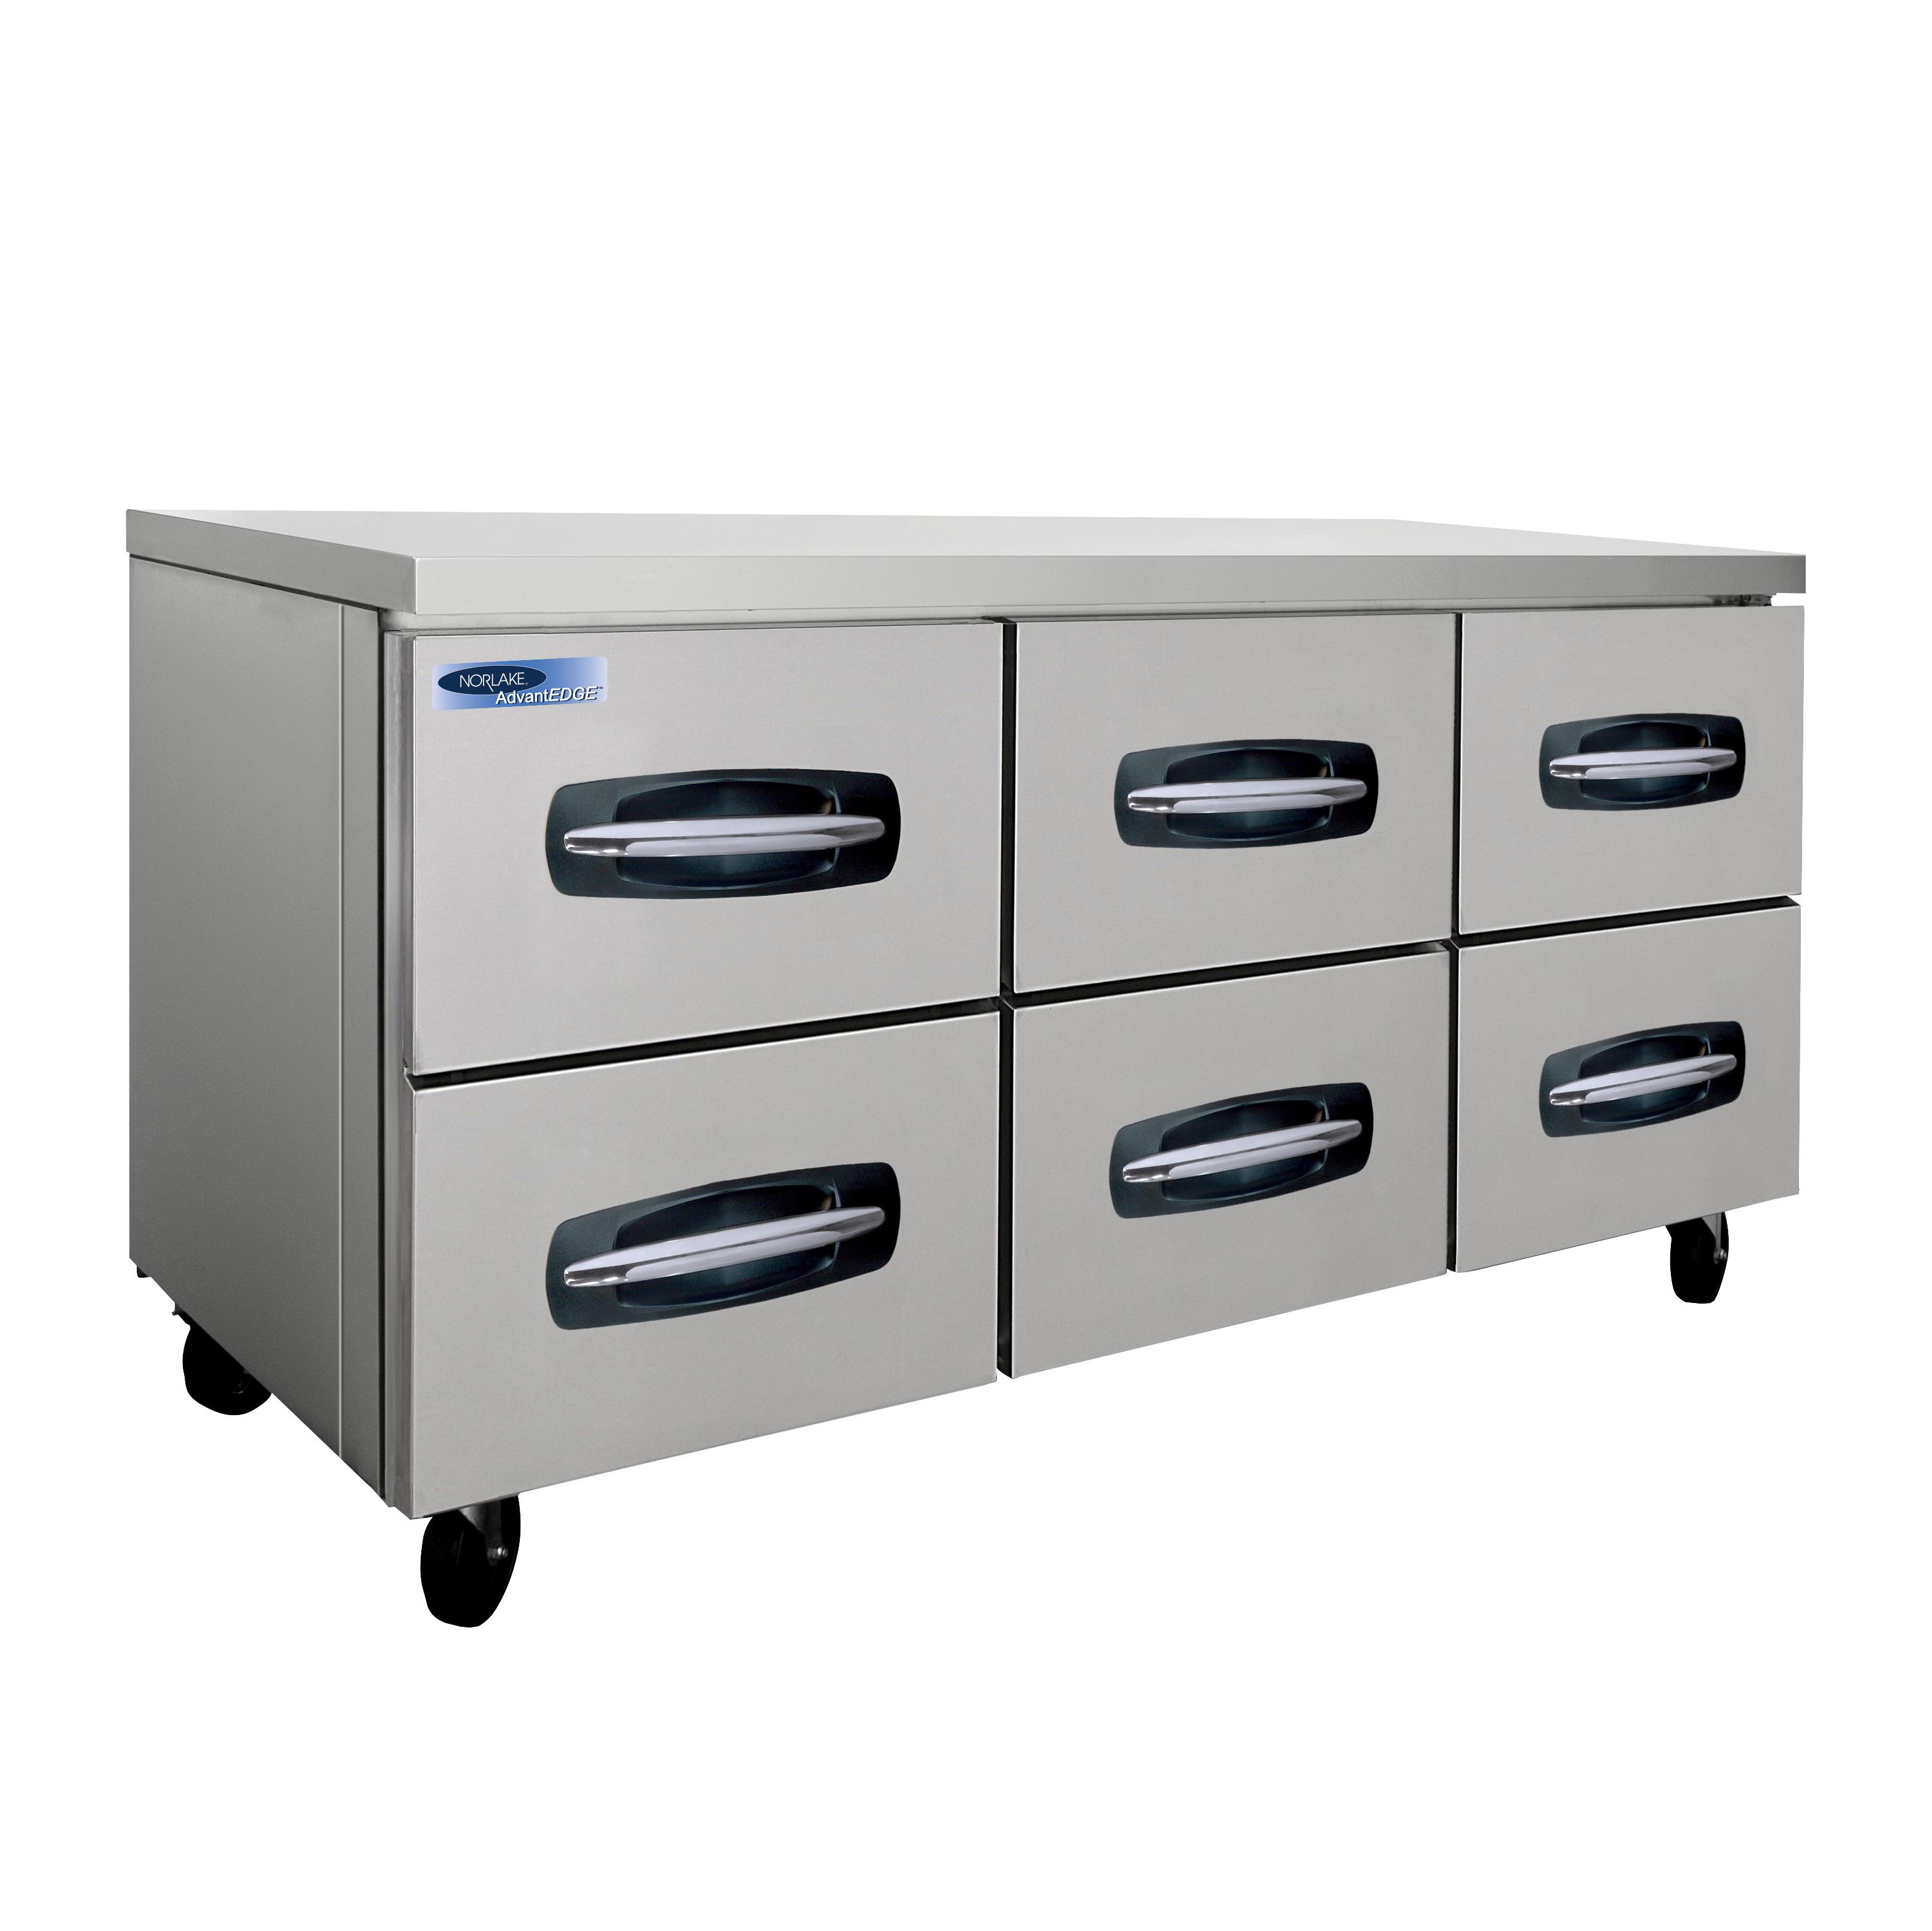 Nor-Lake NLUR72A-001B refrigerator, undercounter, reach-in